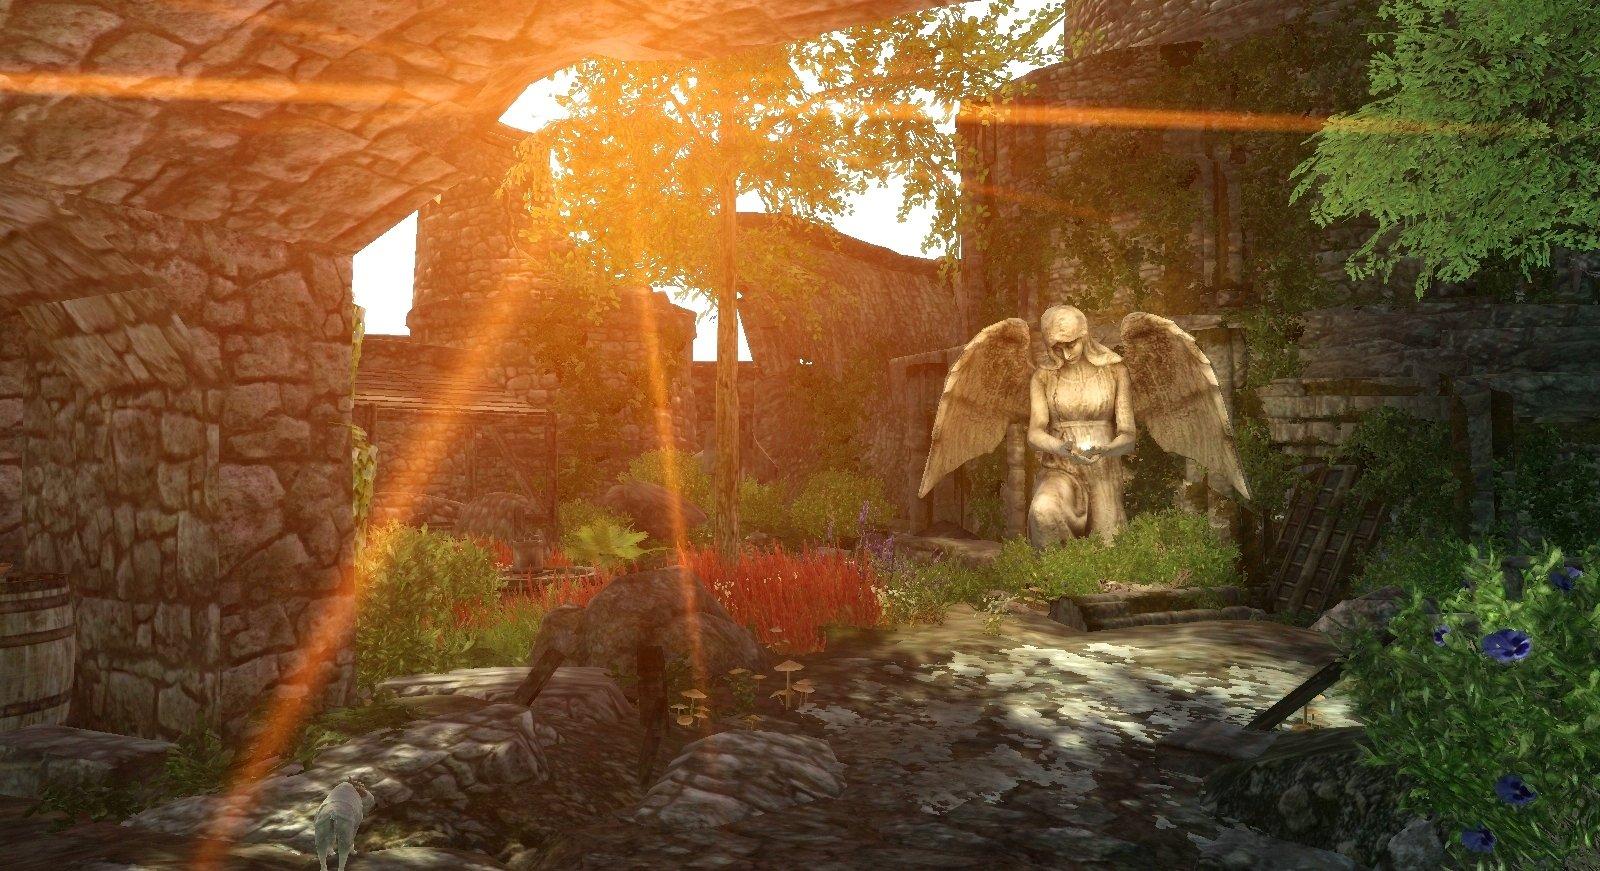 Enderal (сборка 2.0) - глазами Windfire